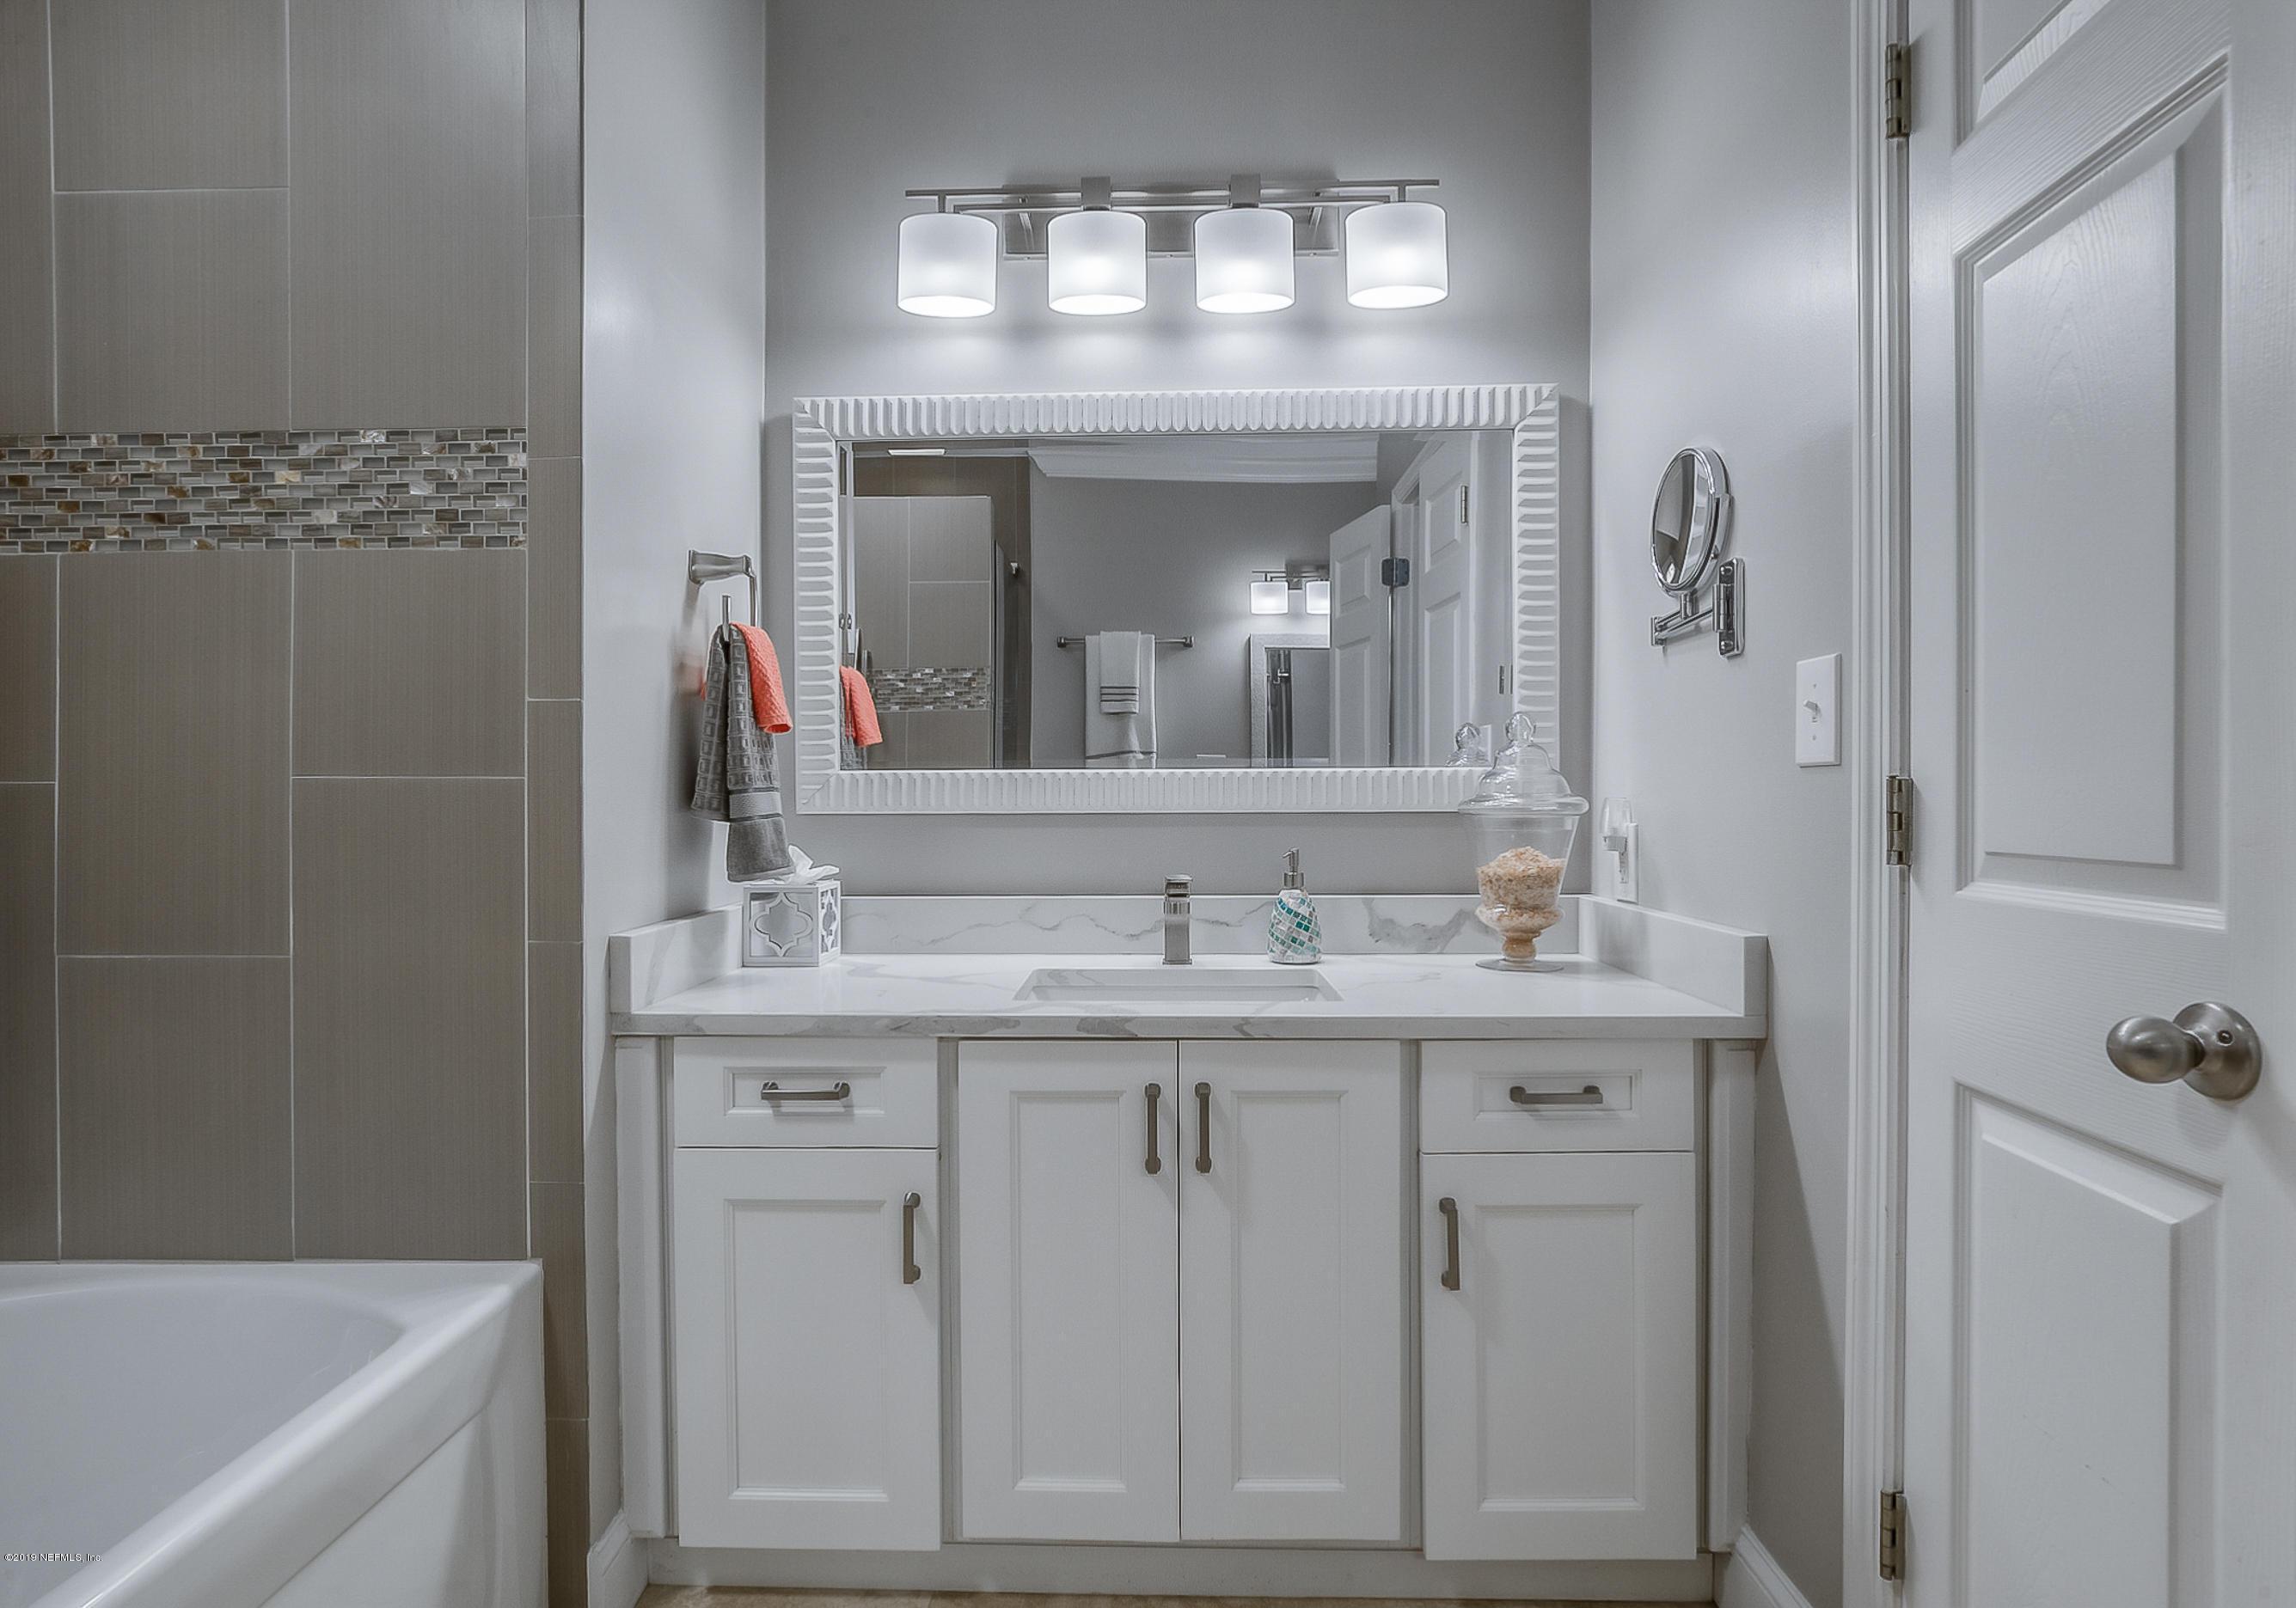 600 PONTE VEDRA- PONTE VEDRA BEACH- FLORIDA 32082, 2 Bedrooms Bedrooms, ,2 BathroomsBathrooms,Condo,For sale,PONTE VEDRA,969135